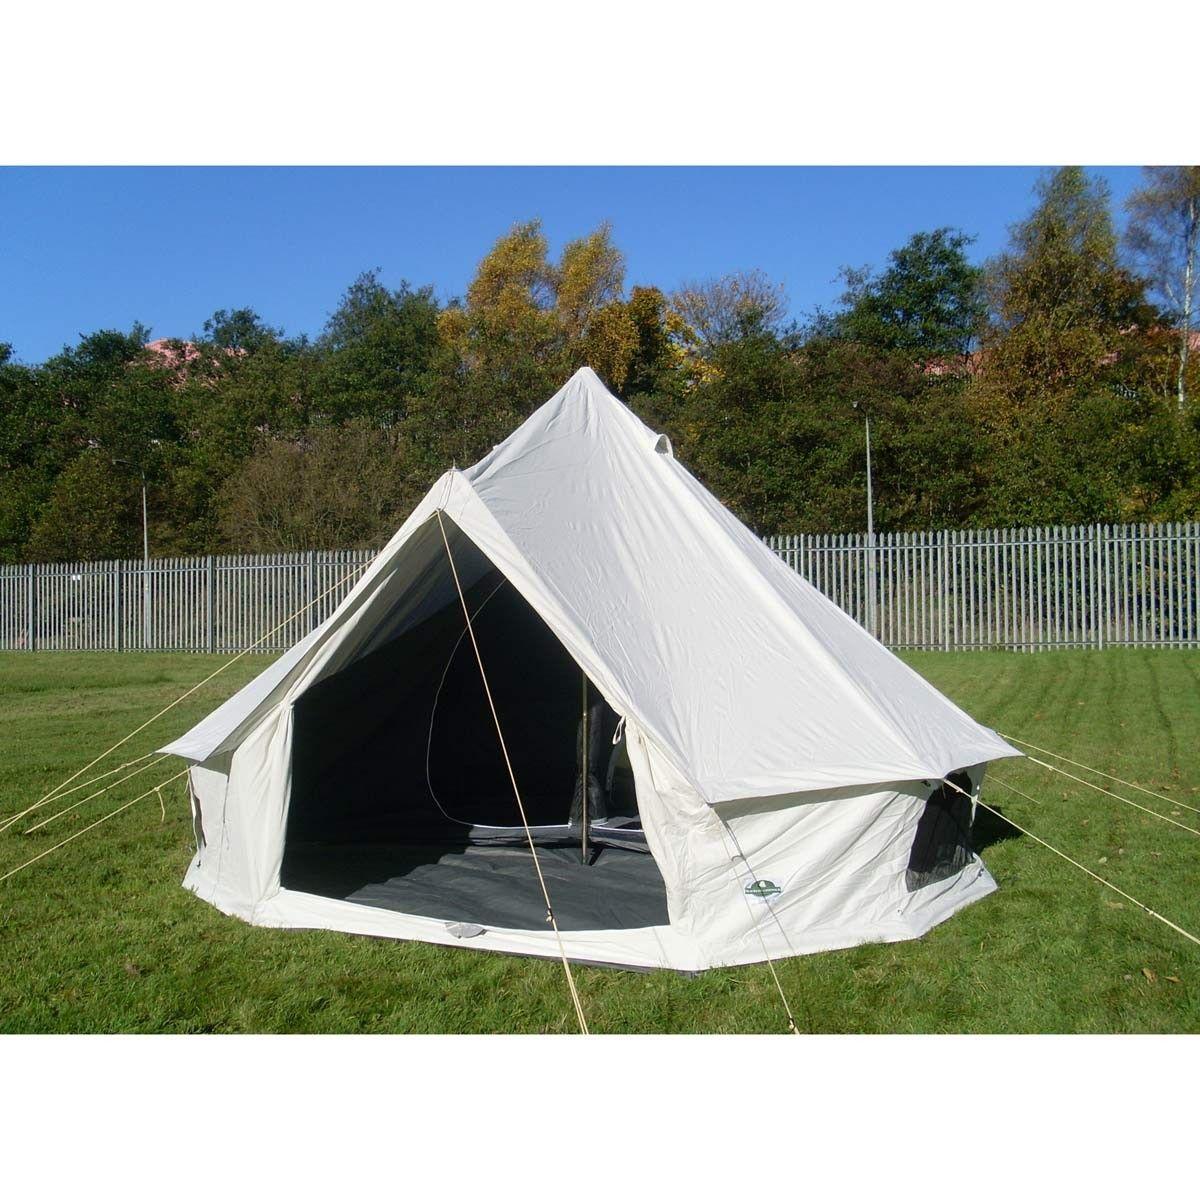 Blacks of Greenock Solace 2 Bell Tent  sc 1 st  Pinterest & Blacks of Greenock Solace 2 Bell Tent | Gers/ tents | Pinterest ...